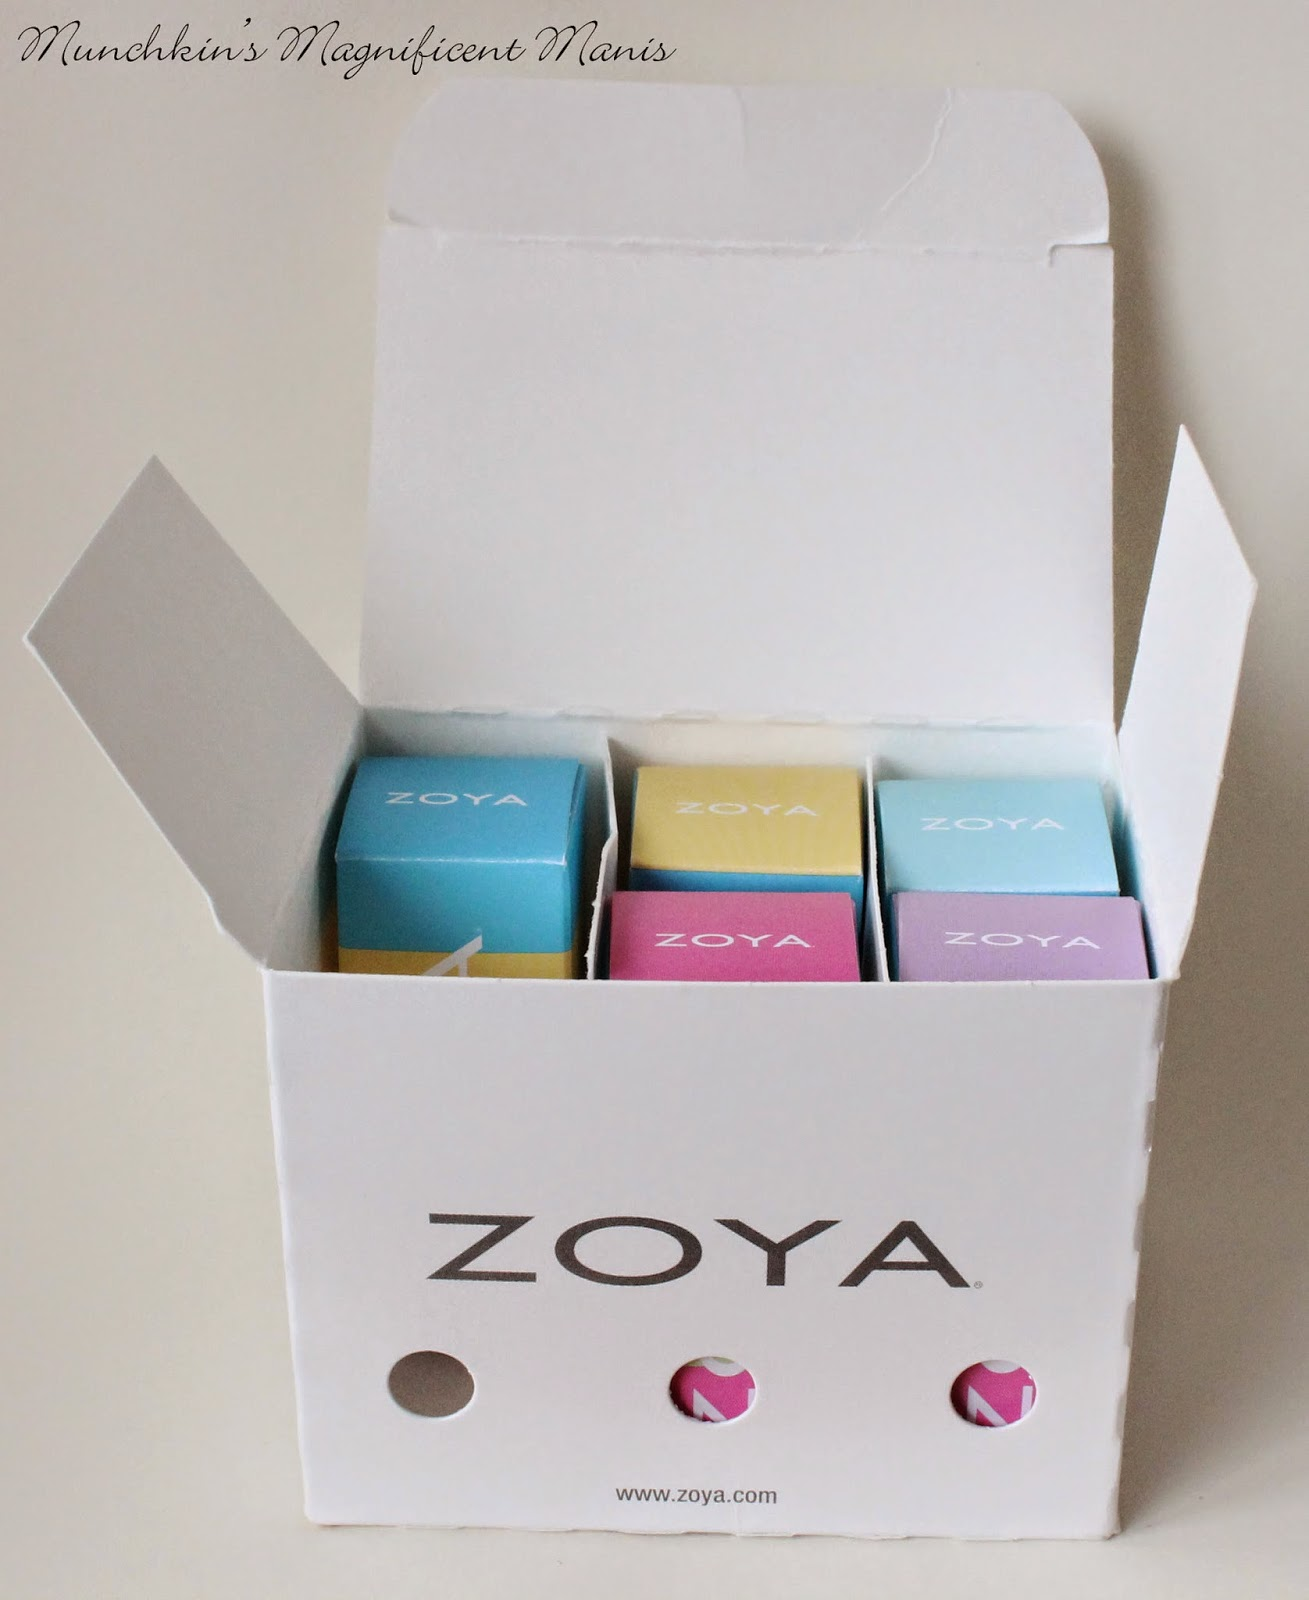 Zoya Delight minis